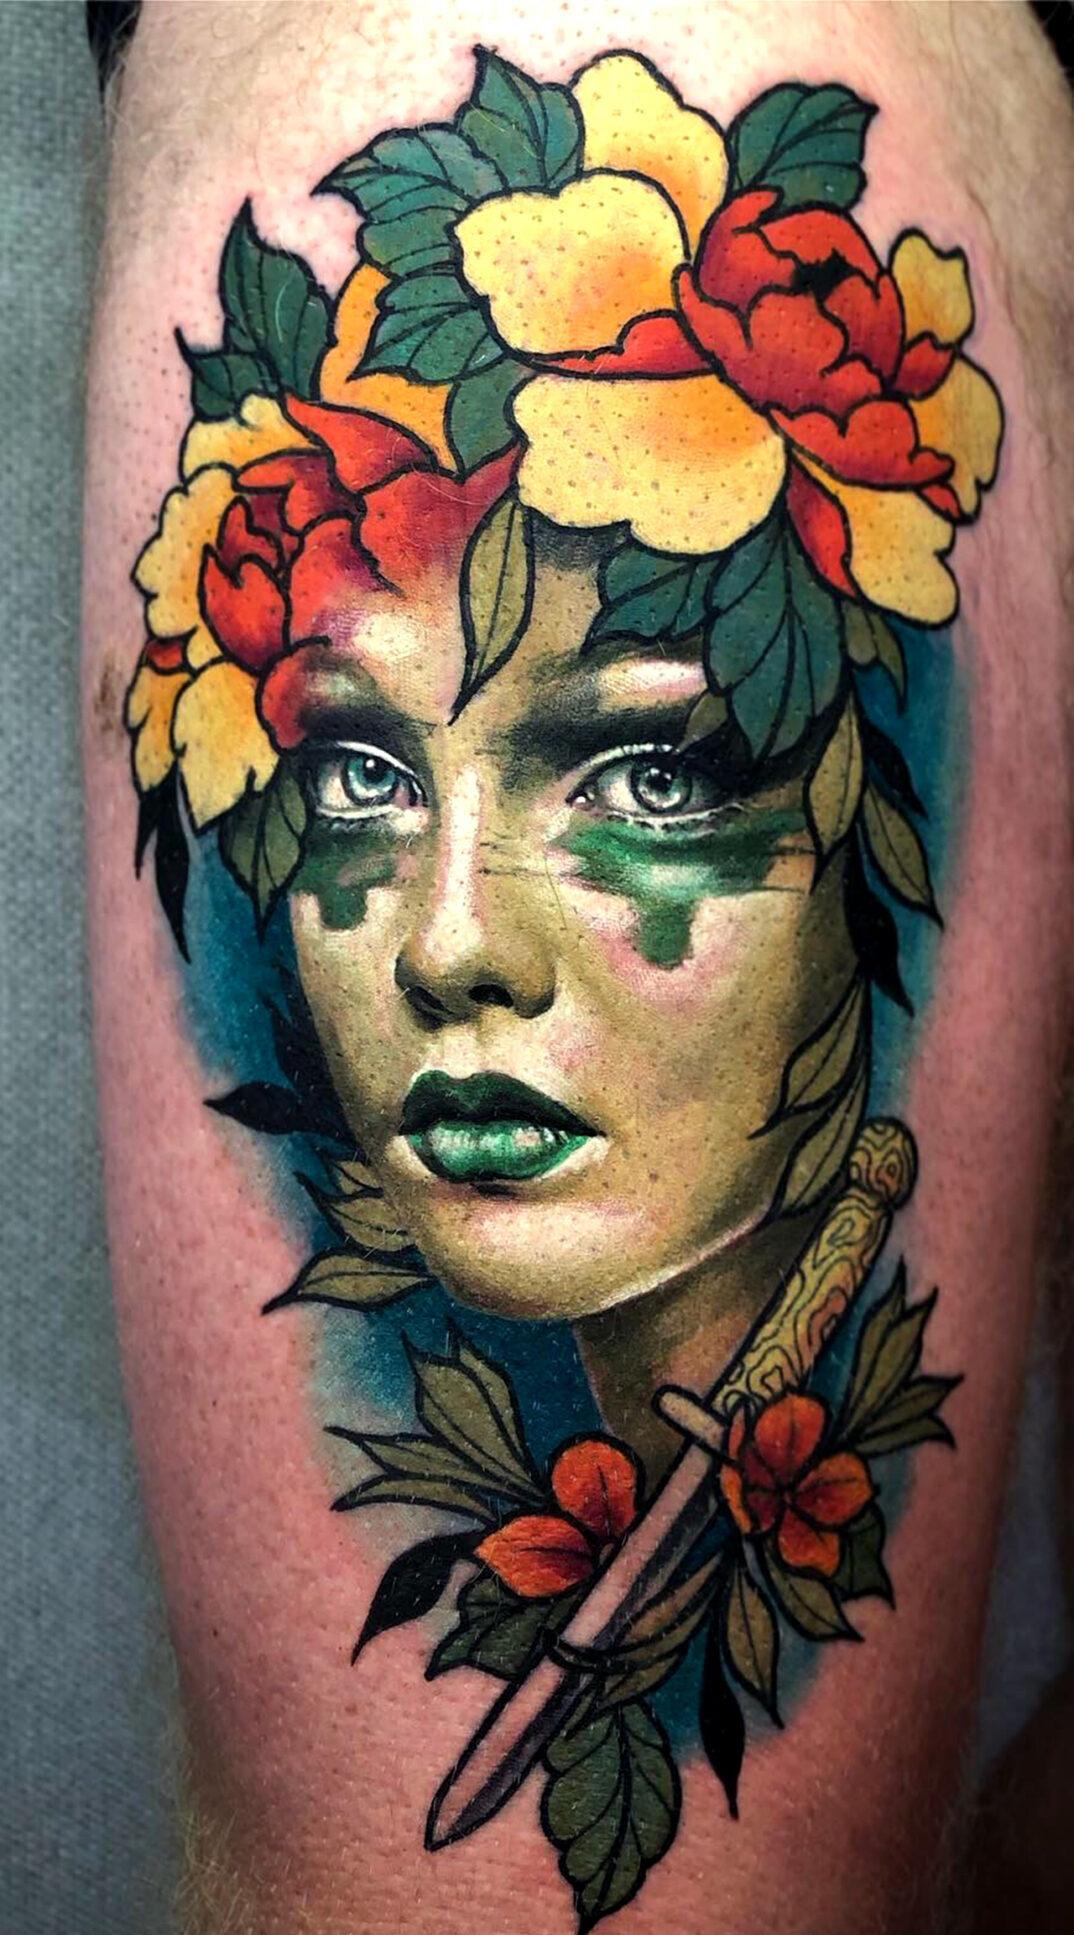 Tattoo by @charlyhuurman